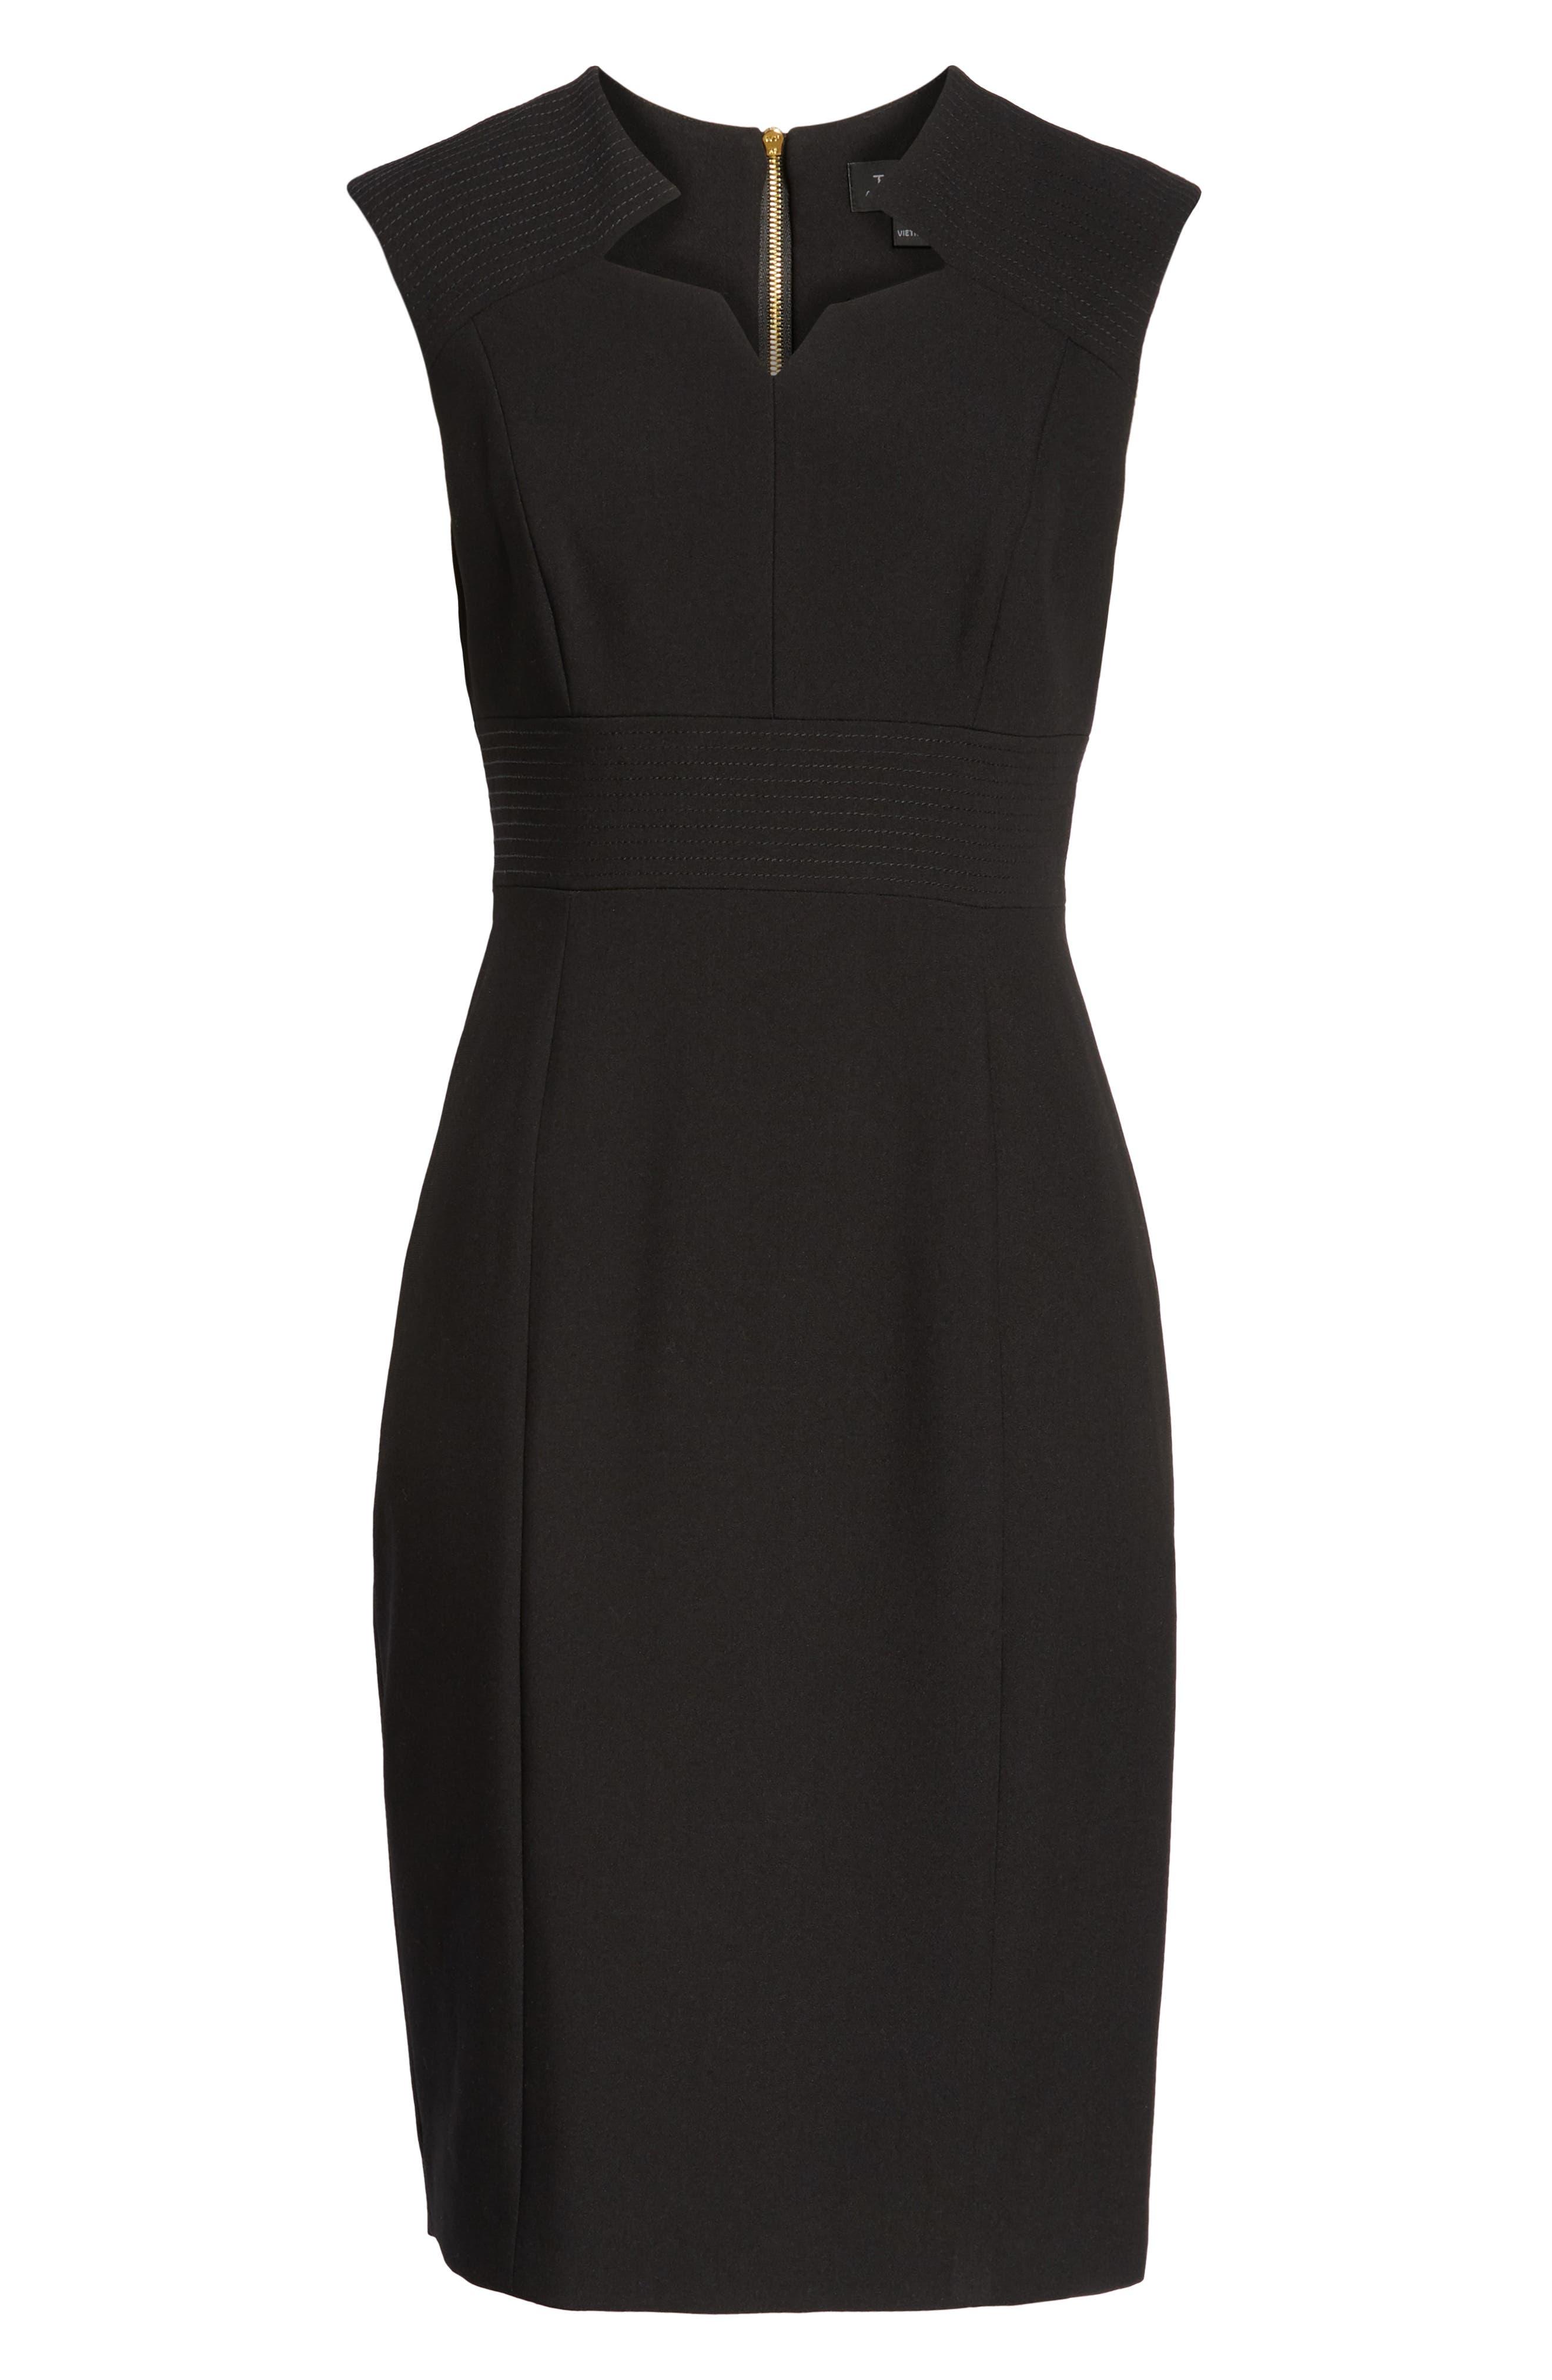 TAHARI,                             Star Neckline Crepe Sheath Dress,                             Alternate thumbnail 7, color,                             BLACK